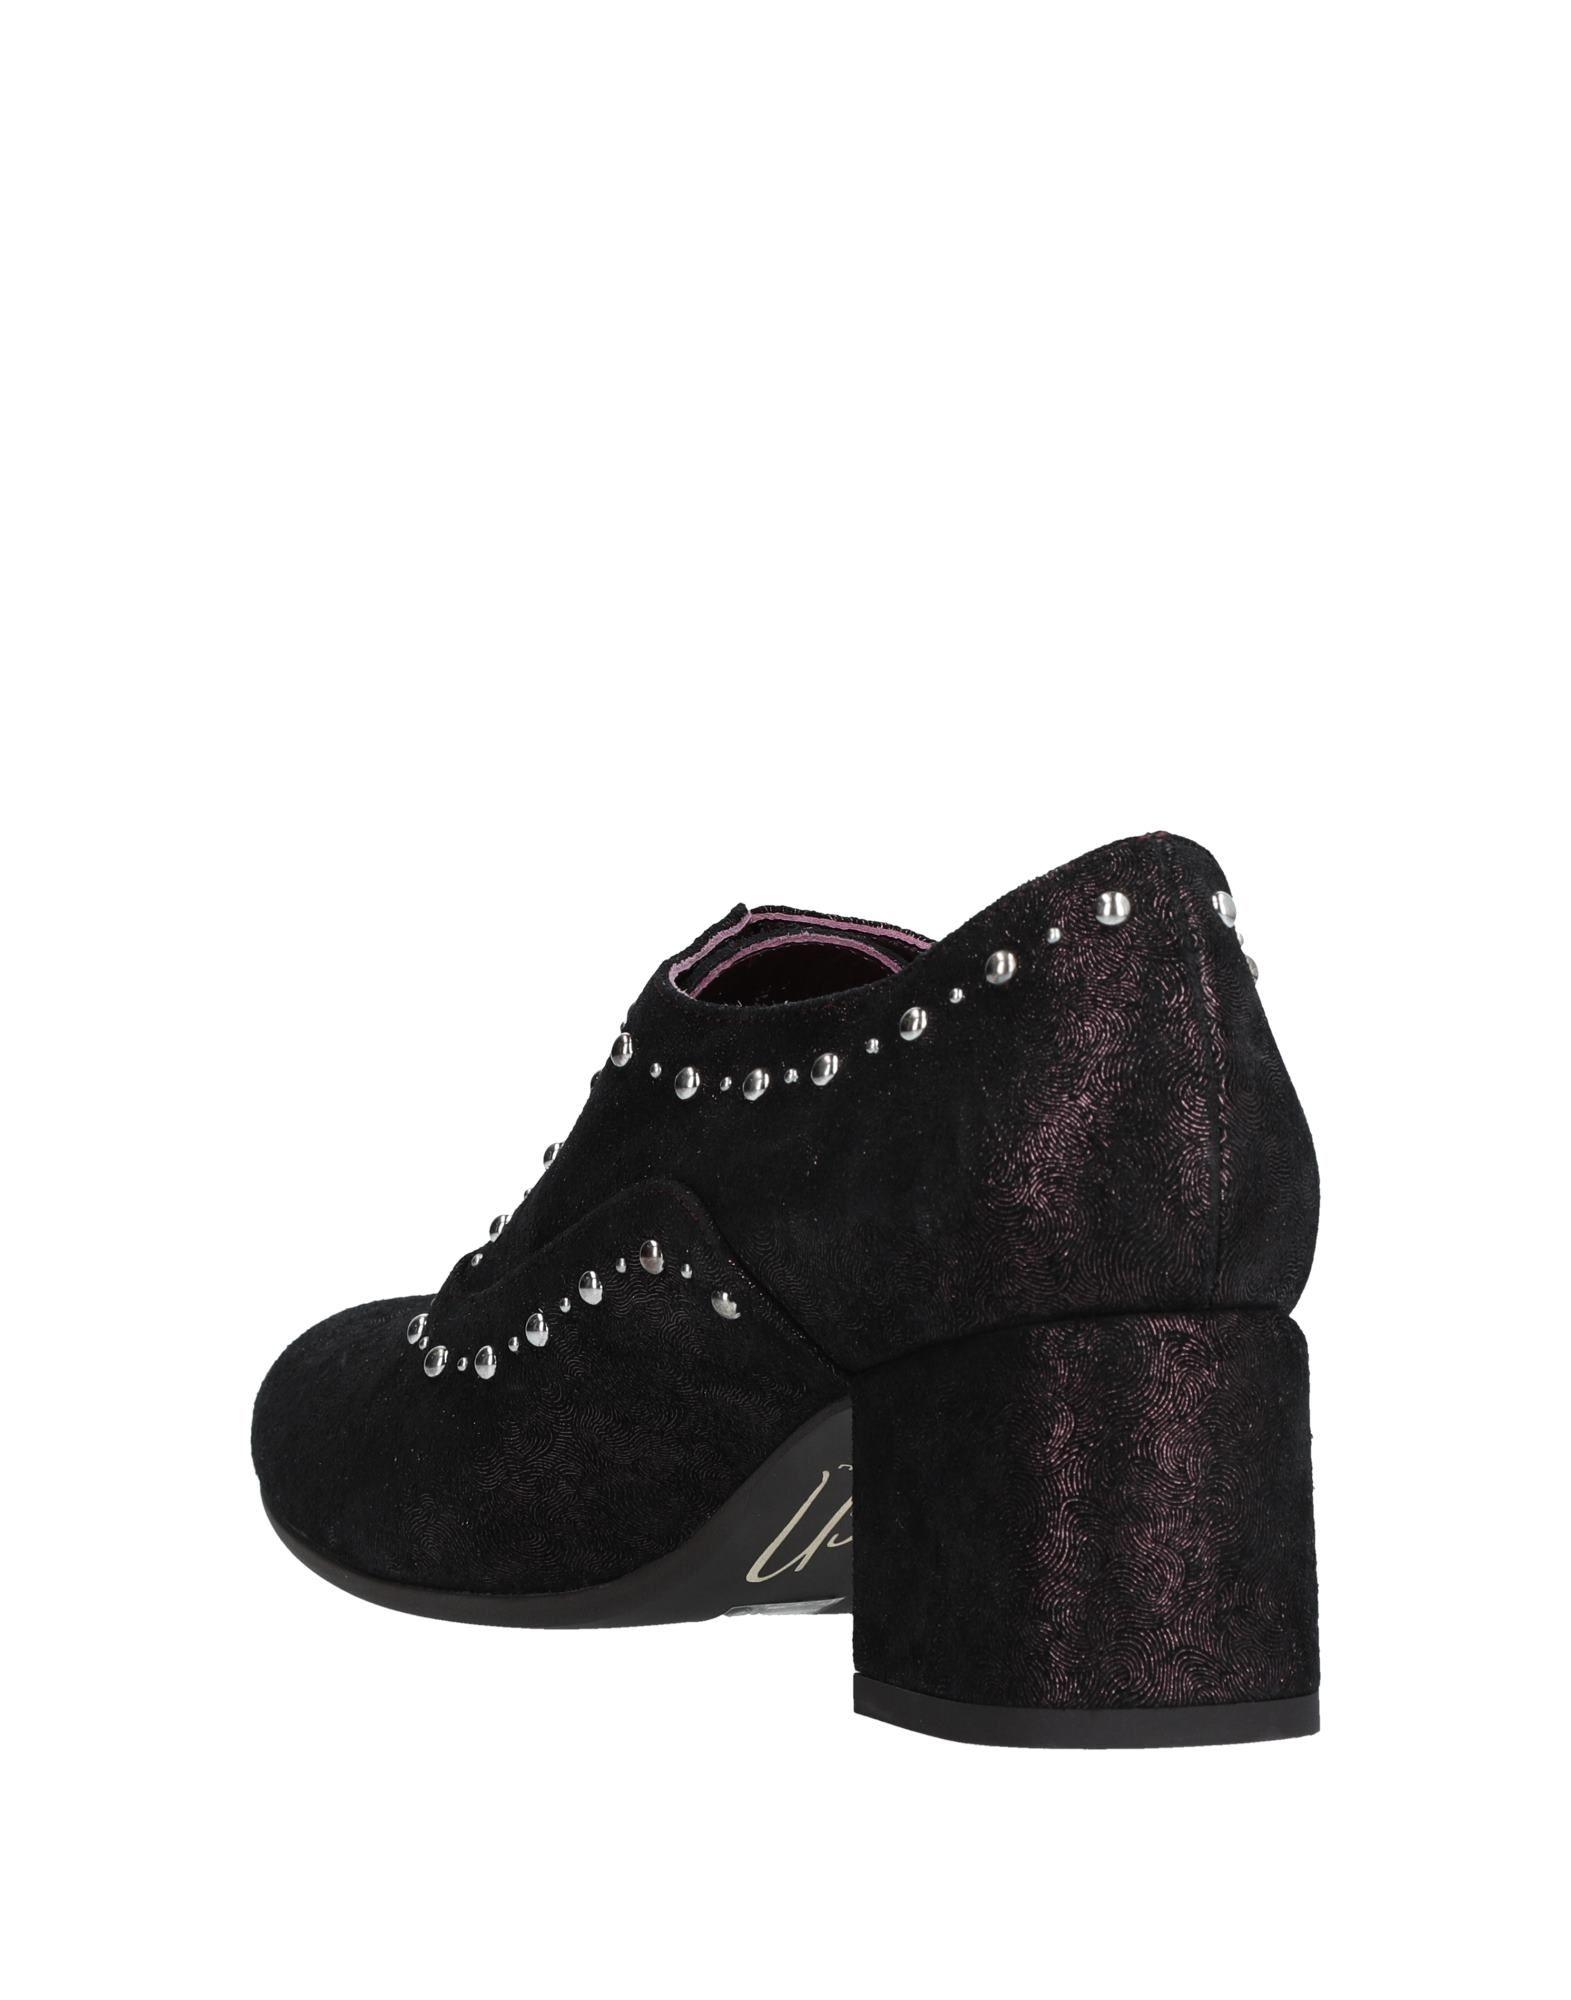 Gut um billige Paoli Schuhe zu tragenSgn Giancarlo Paoli billige Schnürschuhe Damen  11537447UJ bed48d